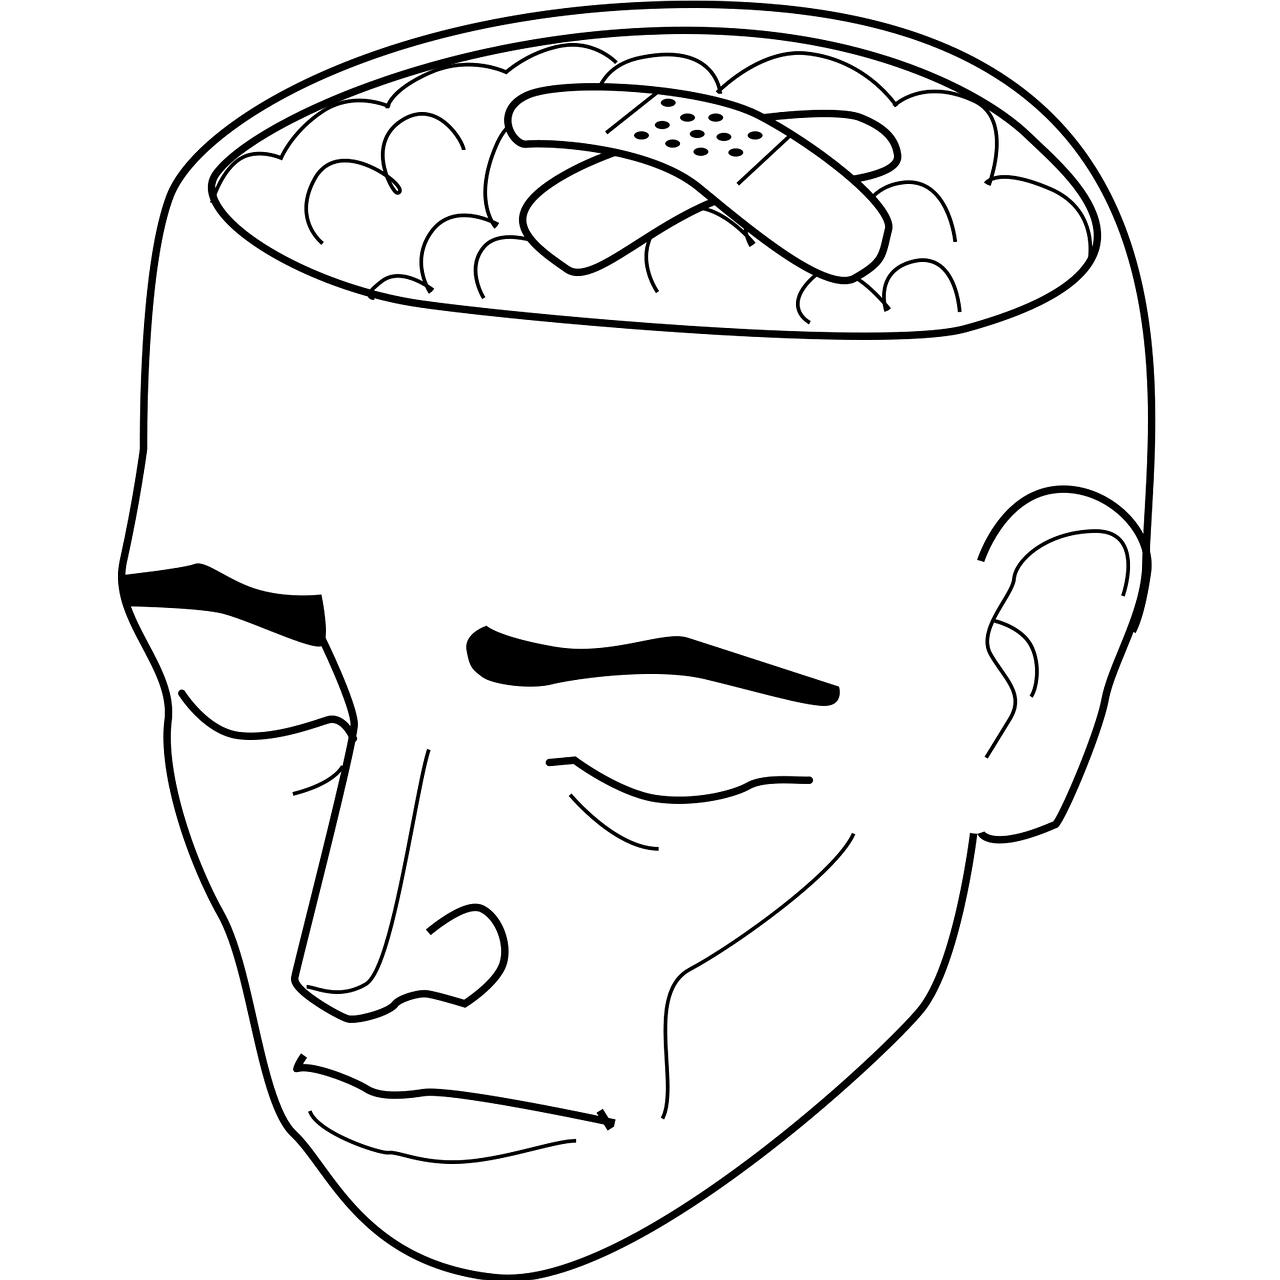 Anxiety,mental health,brain disorder,brain,disorder - free image ...